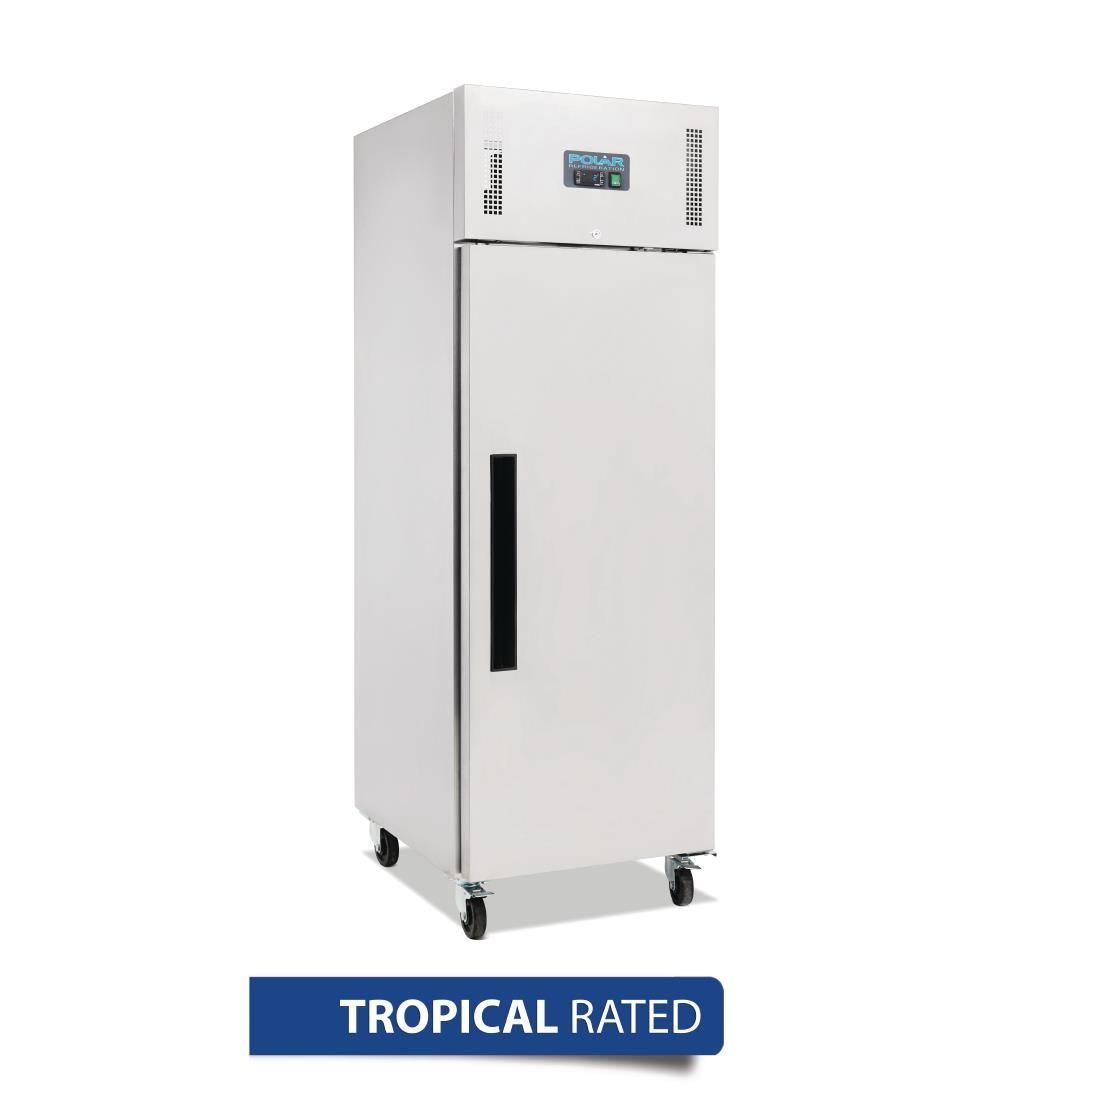 Polar G Series Upright Freezer Stainless Steel 600ltr Stainless Steel Fridge Upright Freezer Upright Fridge